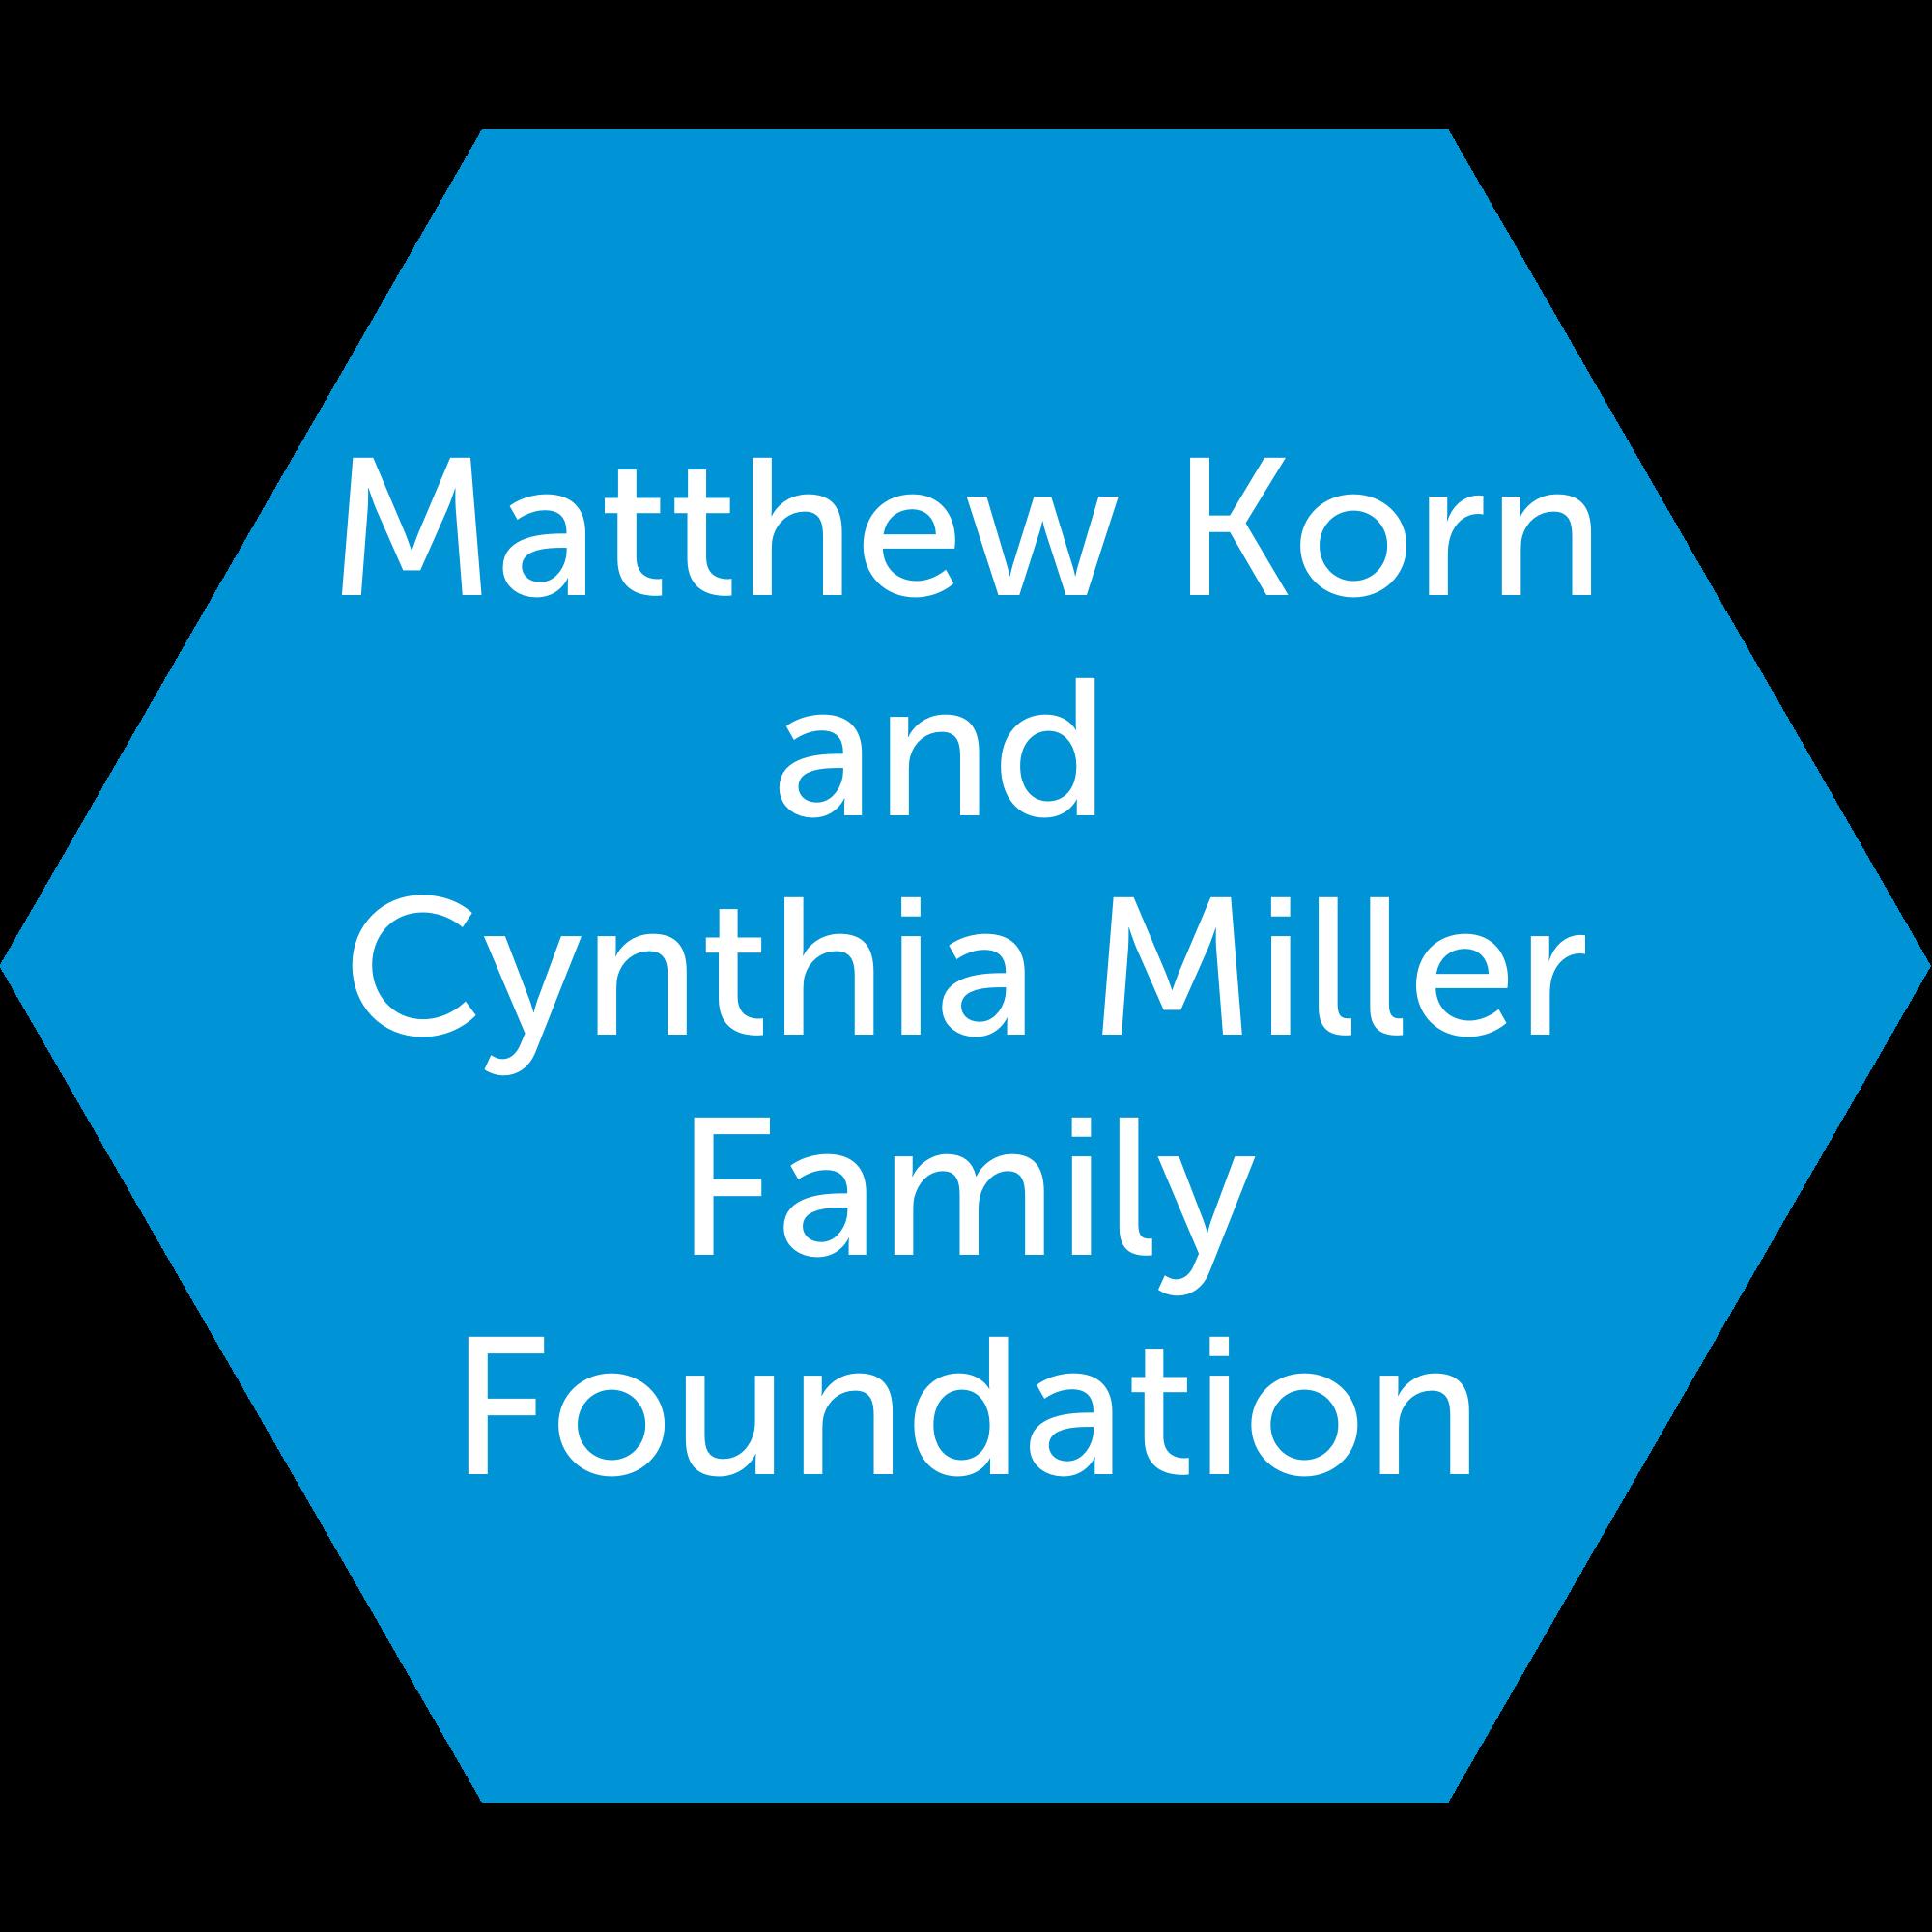 Matthew Korn and Cynthia Miller Family Foundation